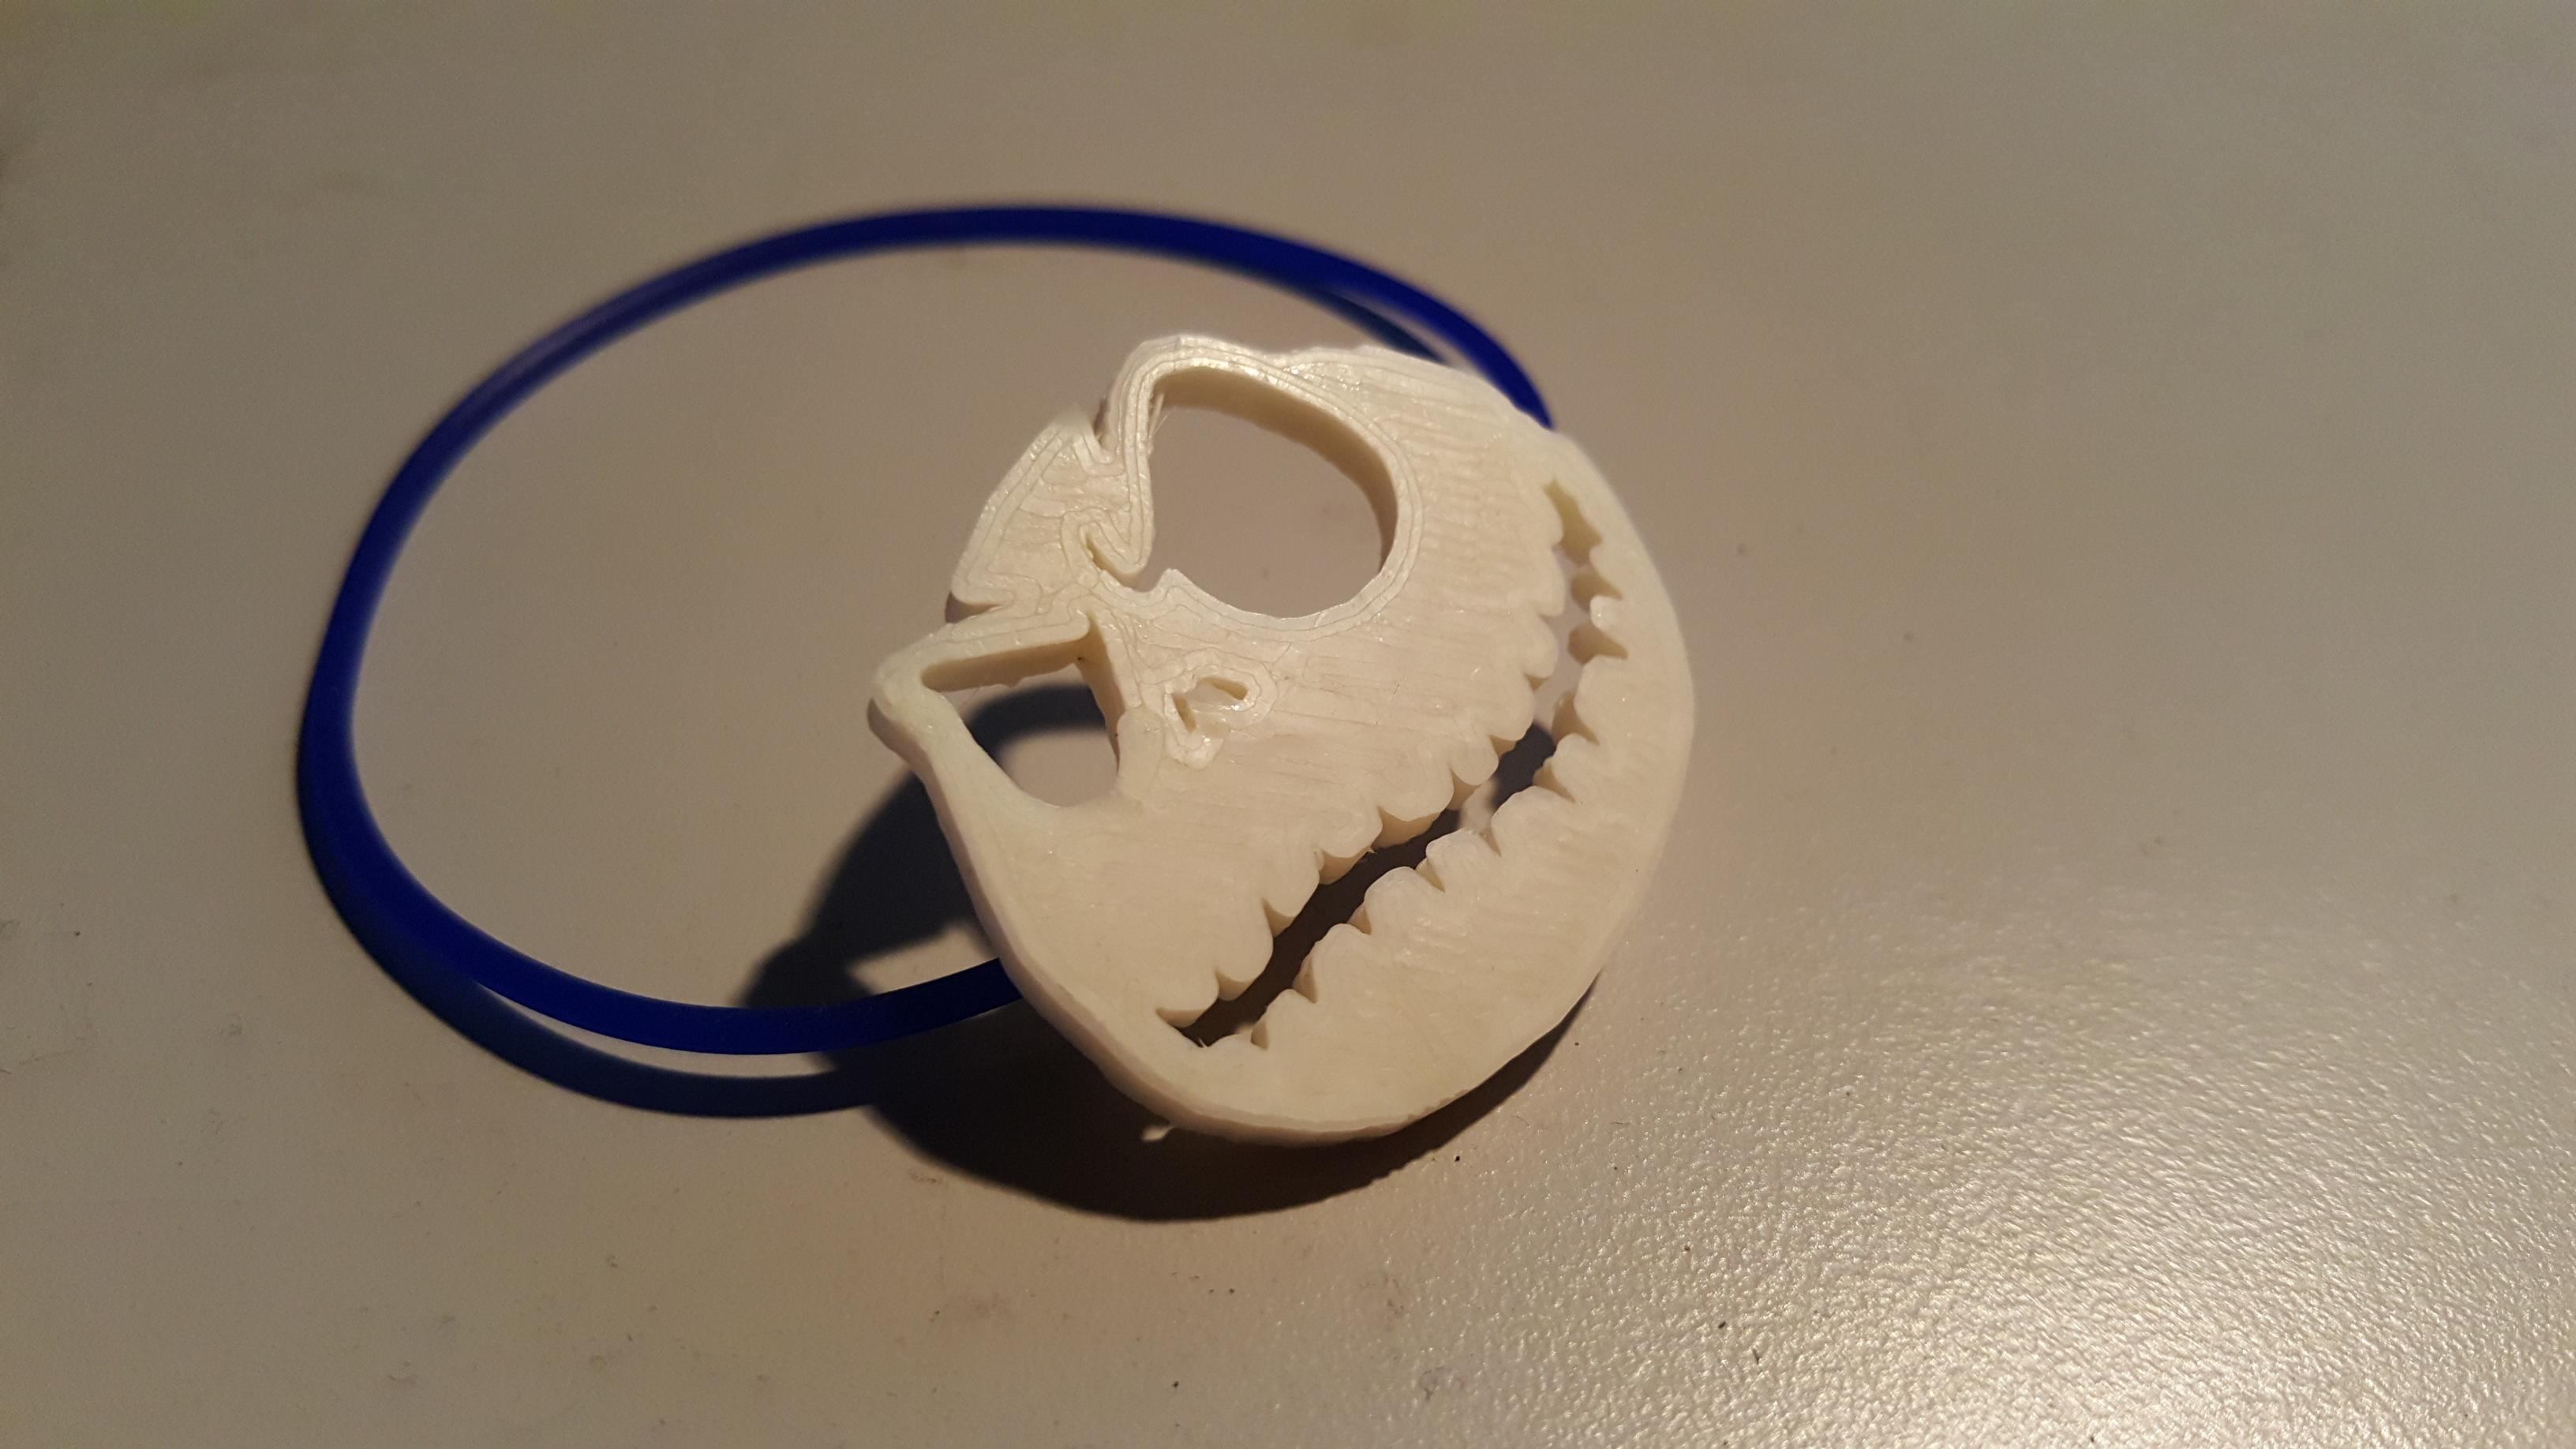 3D Printed Jack Skellington - The Nightmare Before Christmas by ...